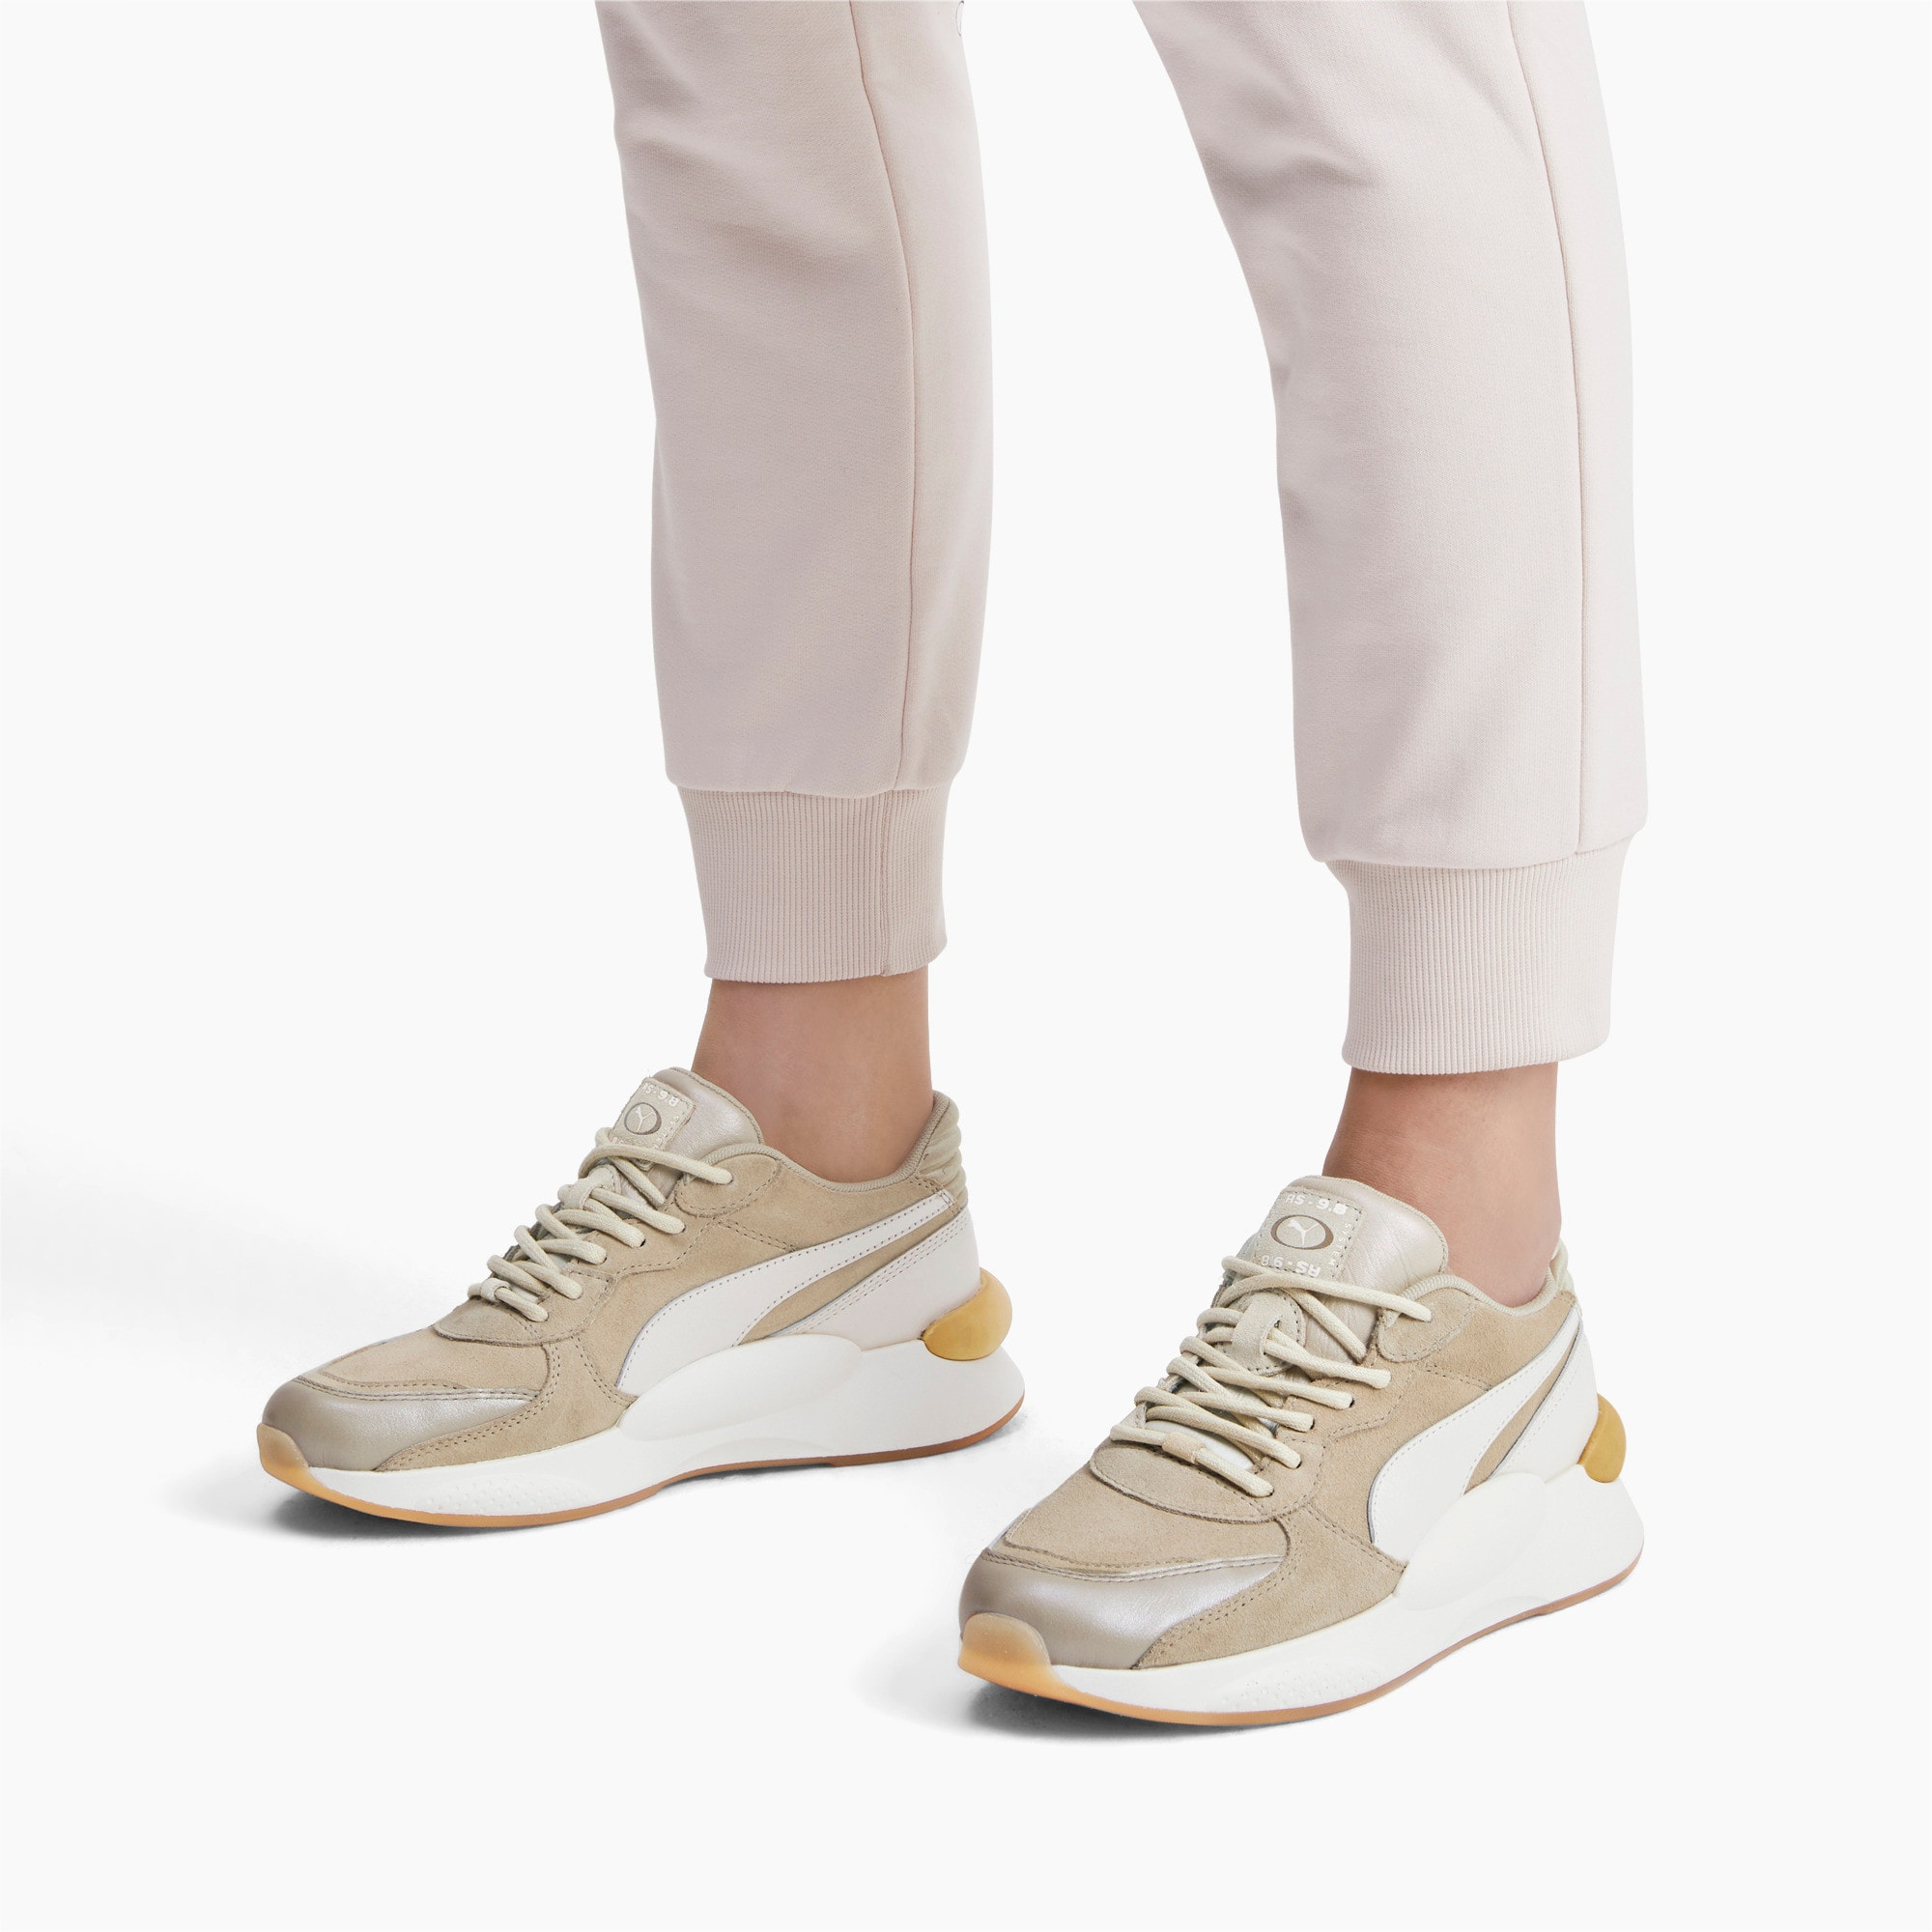 Thumbnail 2 of RS 9.8 Metallic Women's Sneakers, Overcast, medium